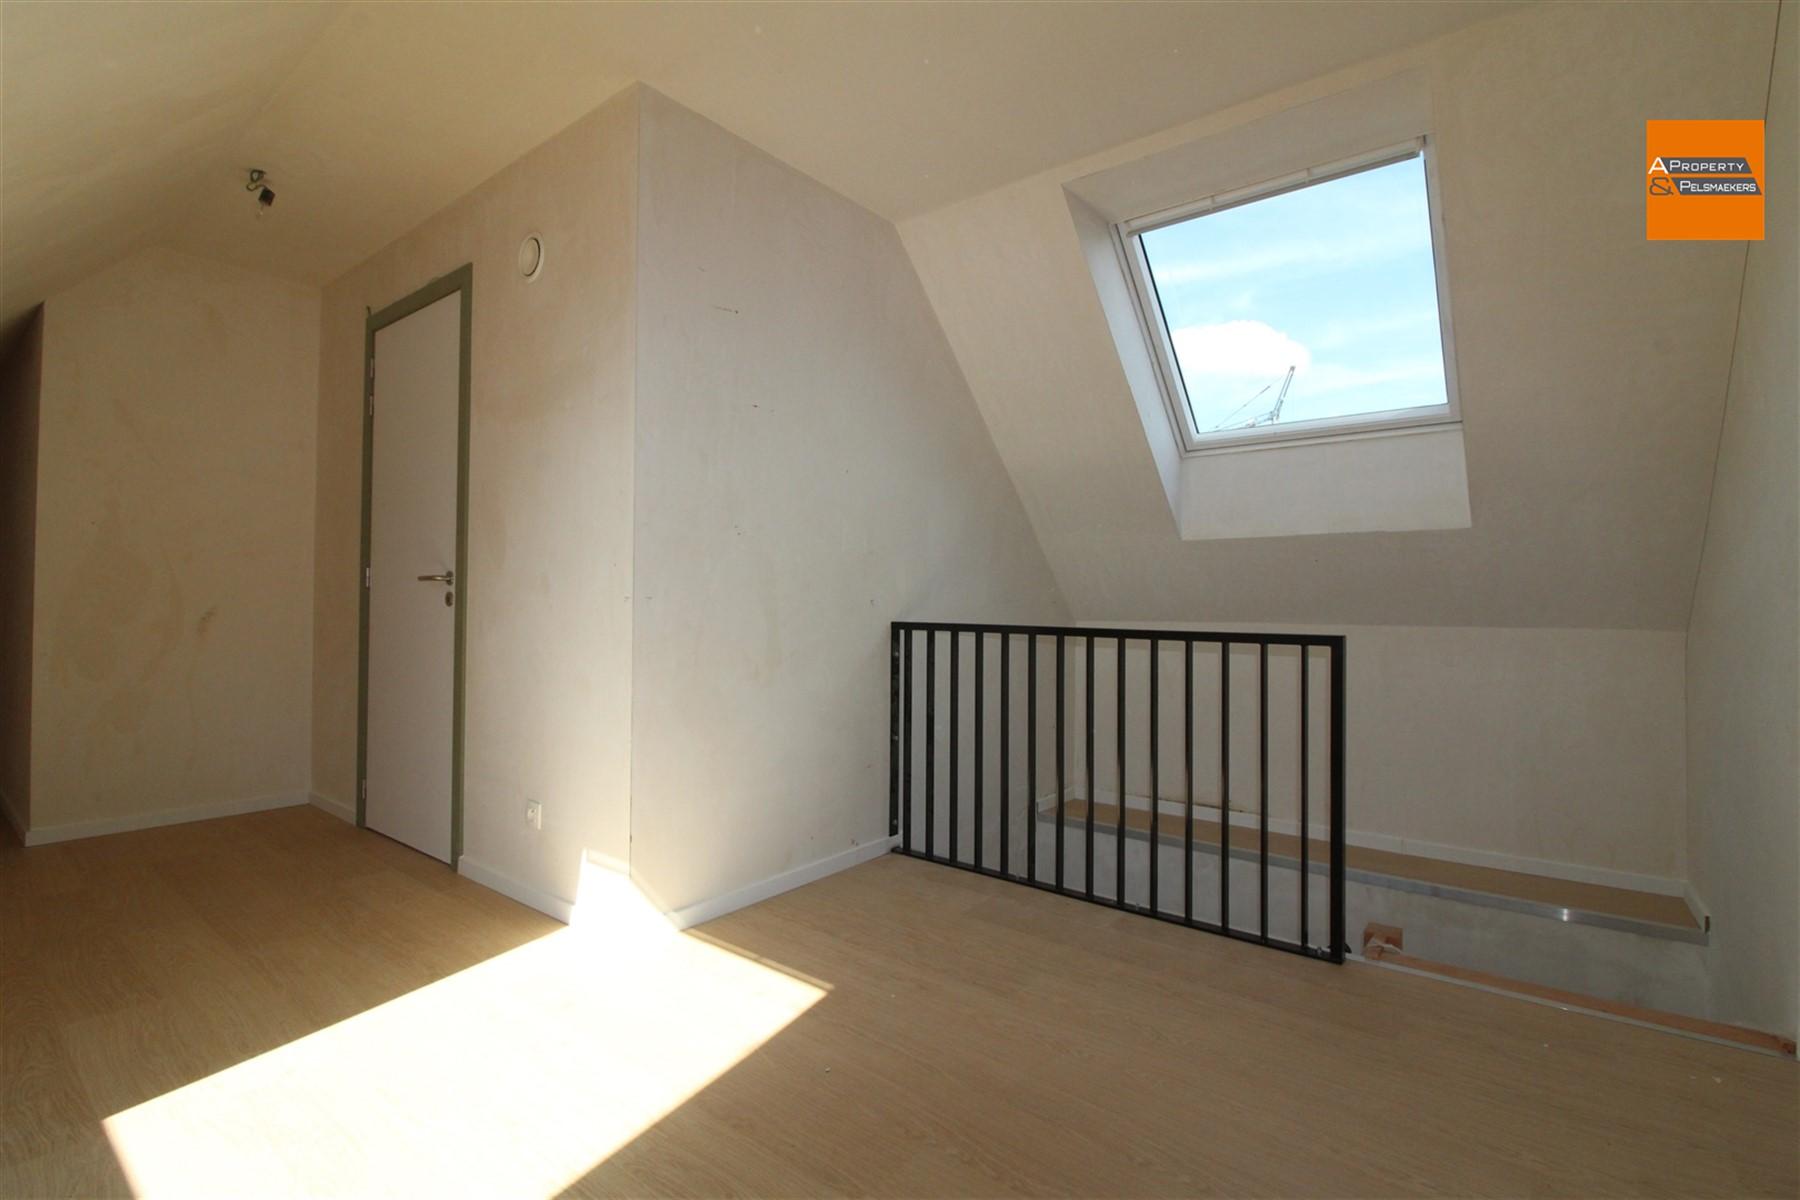 Foto 16 : Duplex/triplex in 3060 BERTEM (België) - Prijs € 319.000